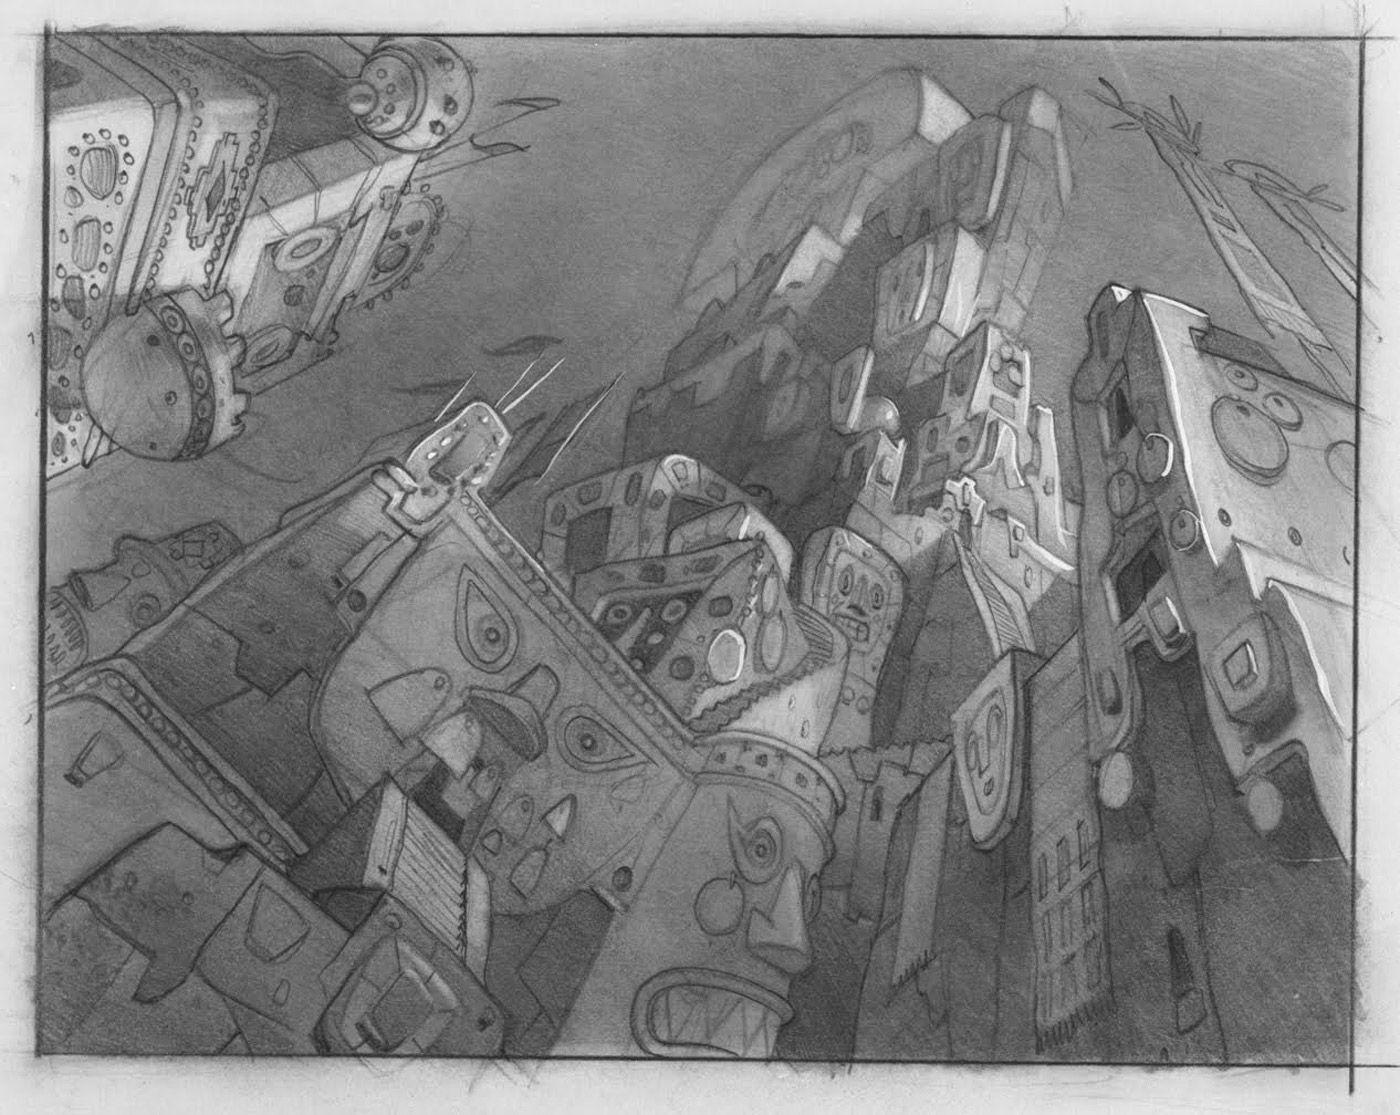 Paul felix the emperor 39 s new groove 2000 backgrounds ambiances dessin projet et urbain - Kuzco dessin anime ...